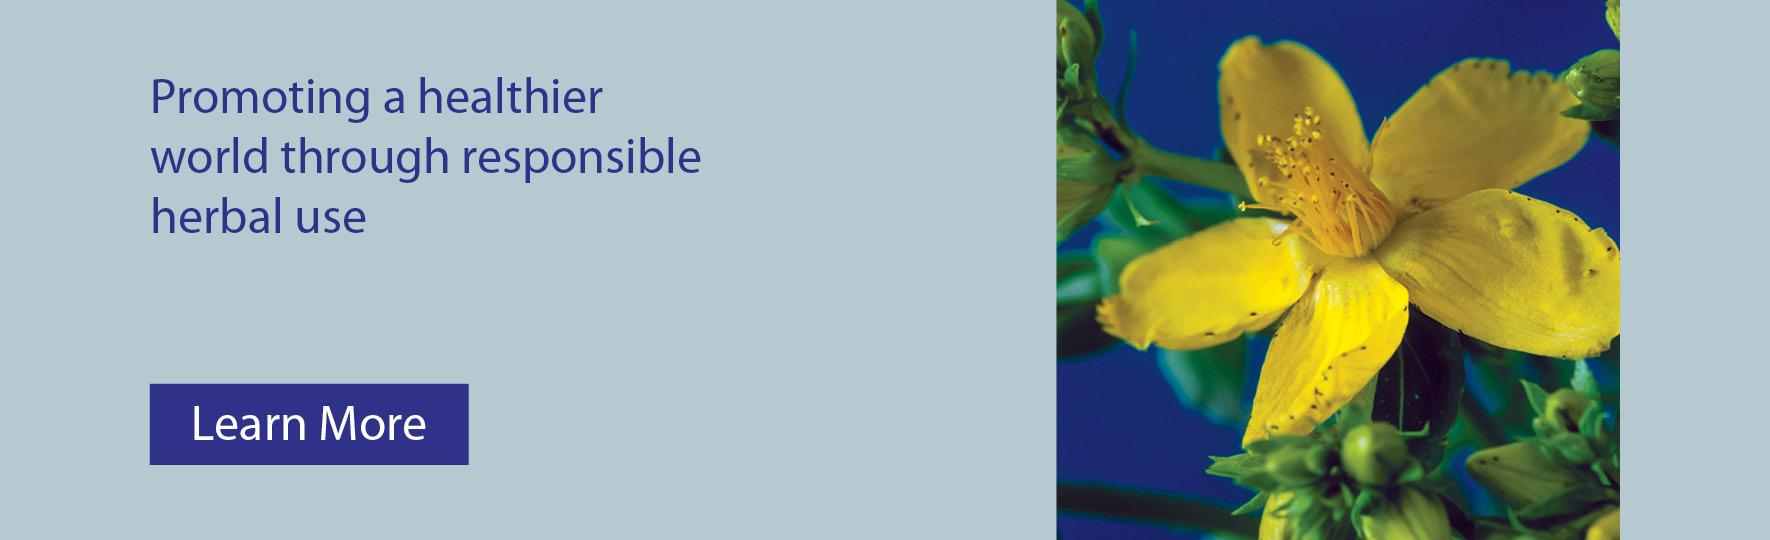 Reliable Herbal Medicine Information American Botanical Council American Botanical Council